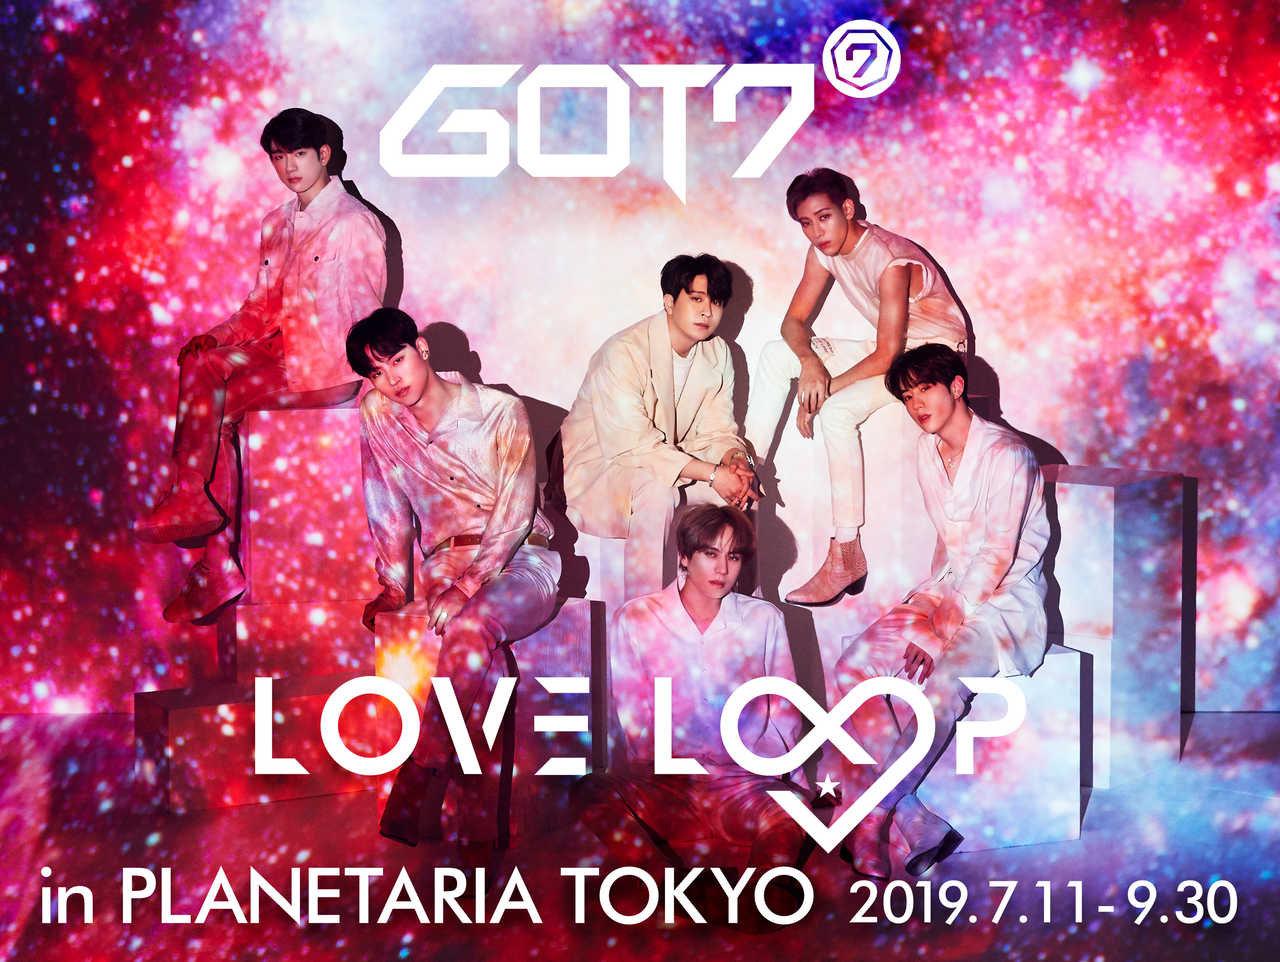 GOT7、新作アルバム収録曲をプラネタリウムで初解禁!!